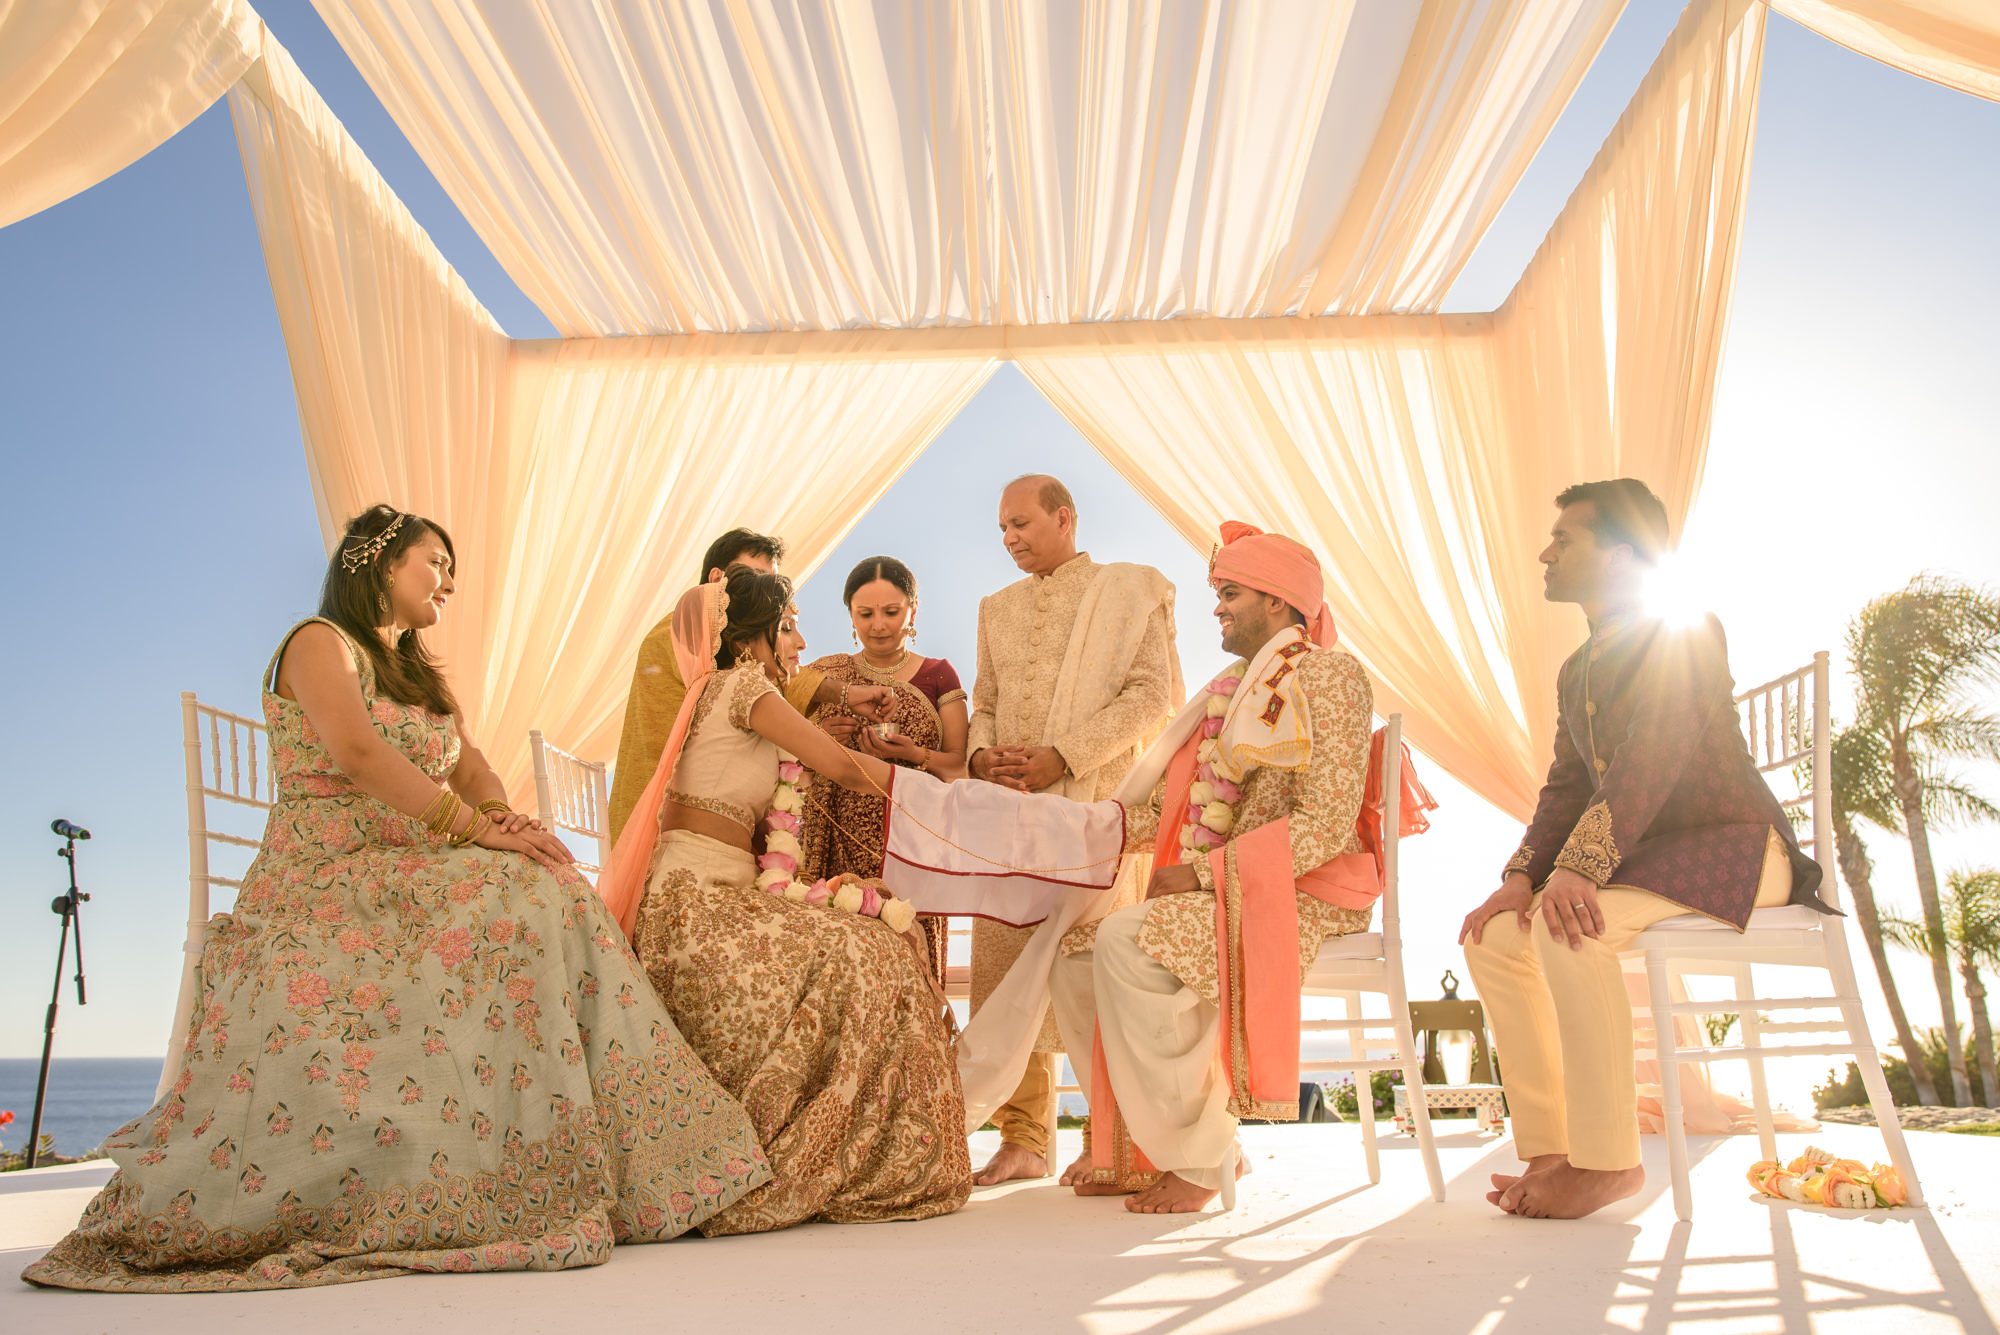 satnam photography wedding indian asian hindu destination wedding photographer tenerife ritz carlton abama-173.jpg